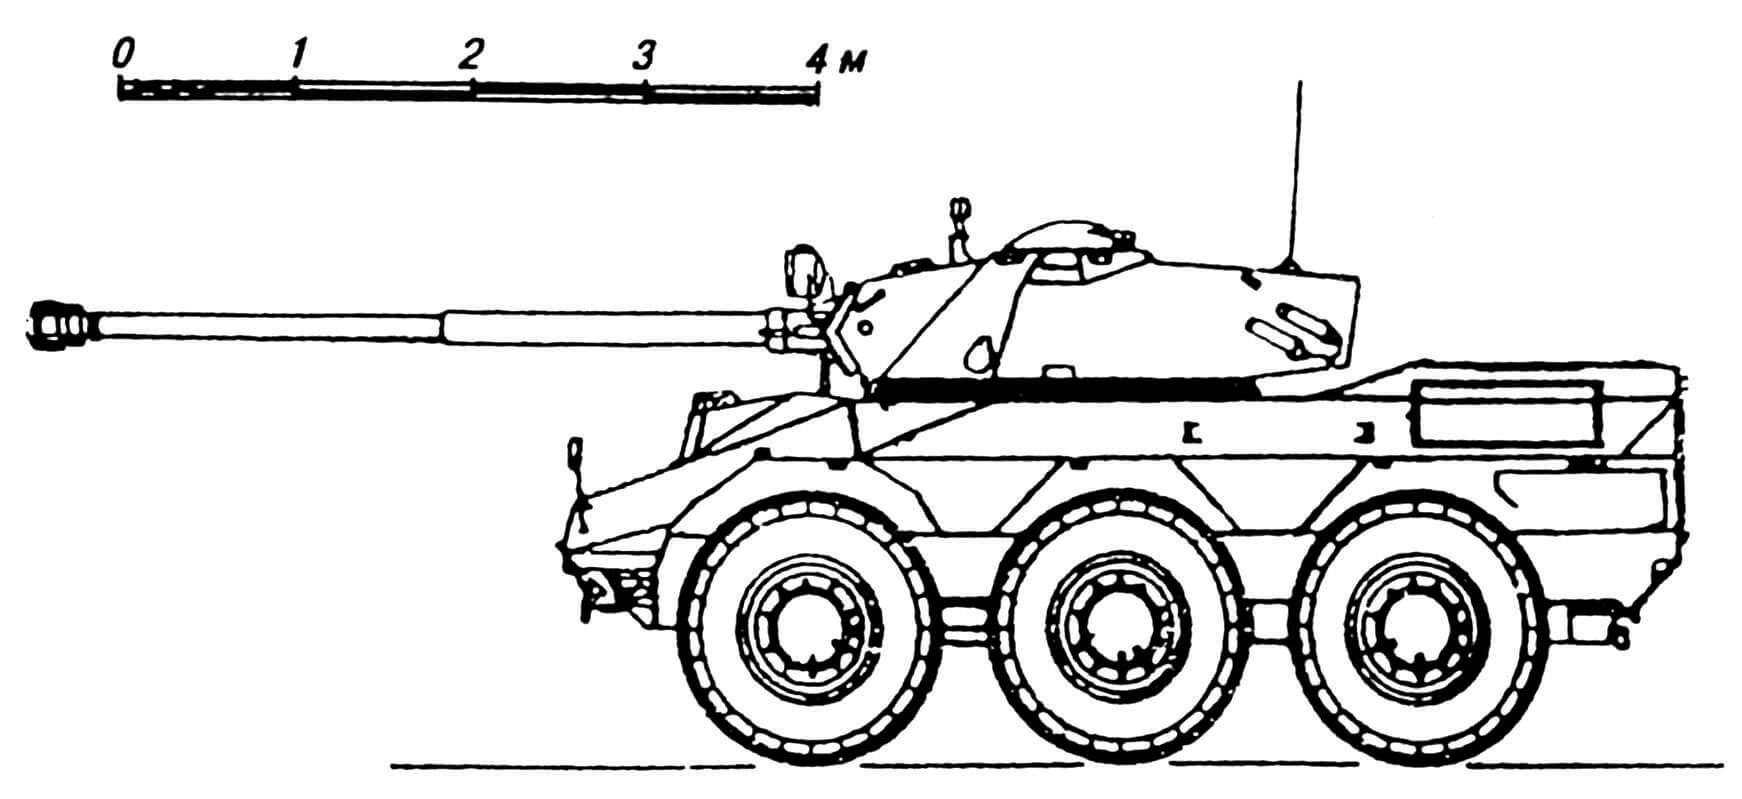 БРМ VBC-90 с 90-мм пушкой «Конерга» 90/46